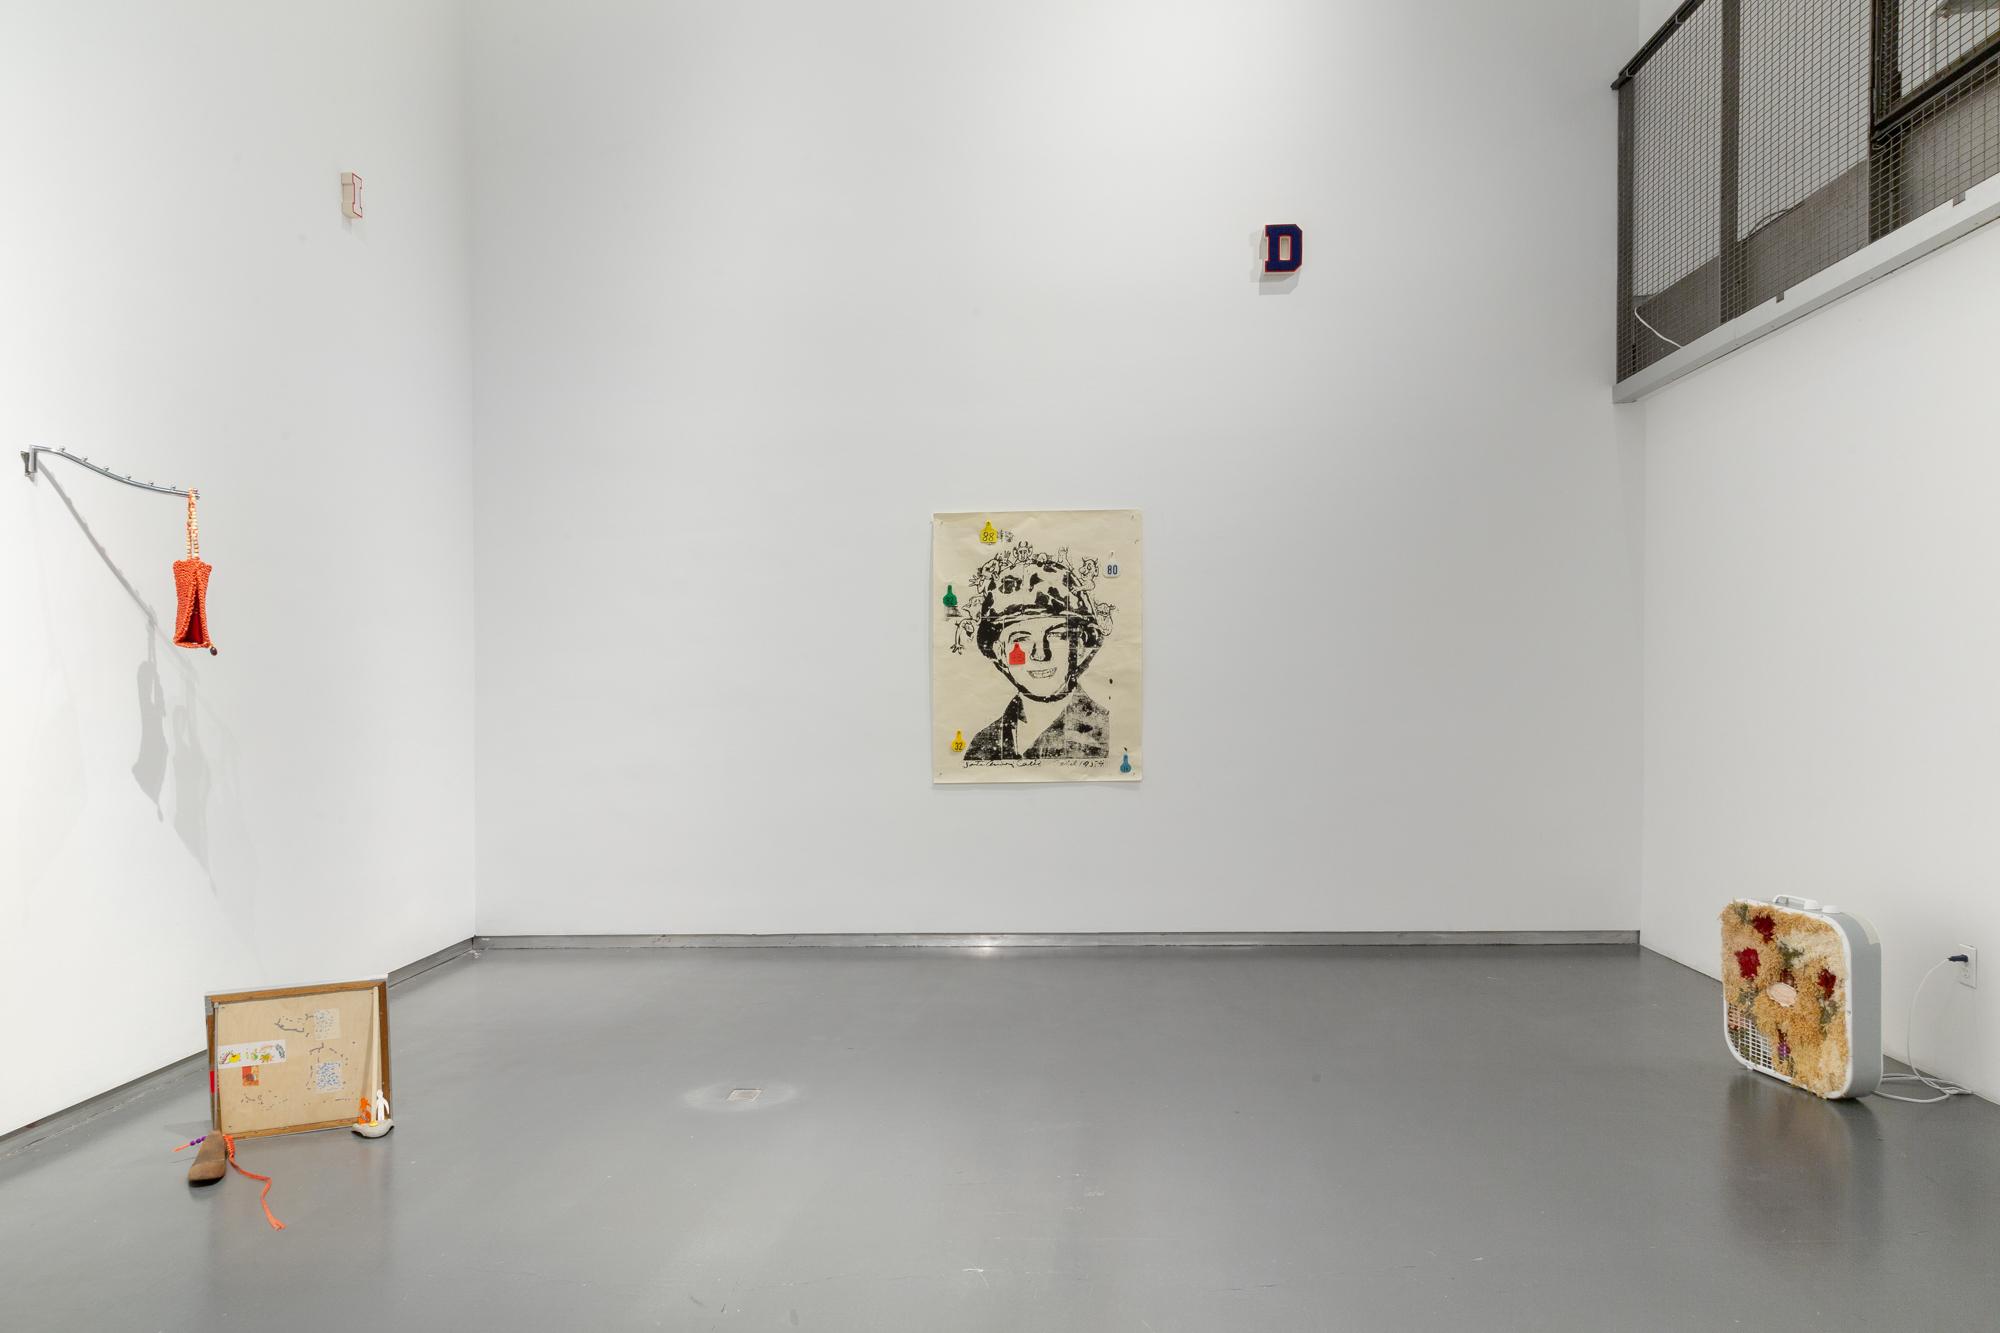 Remnant, Artifact, Flow - Thierry Goldberg